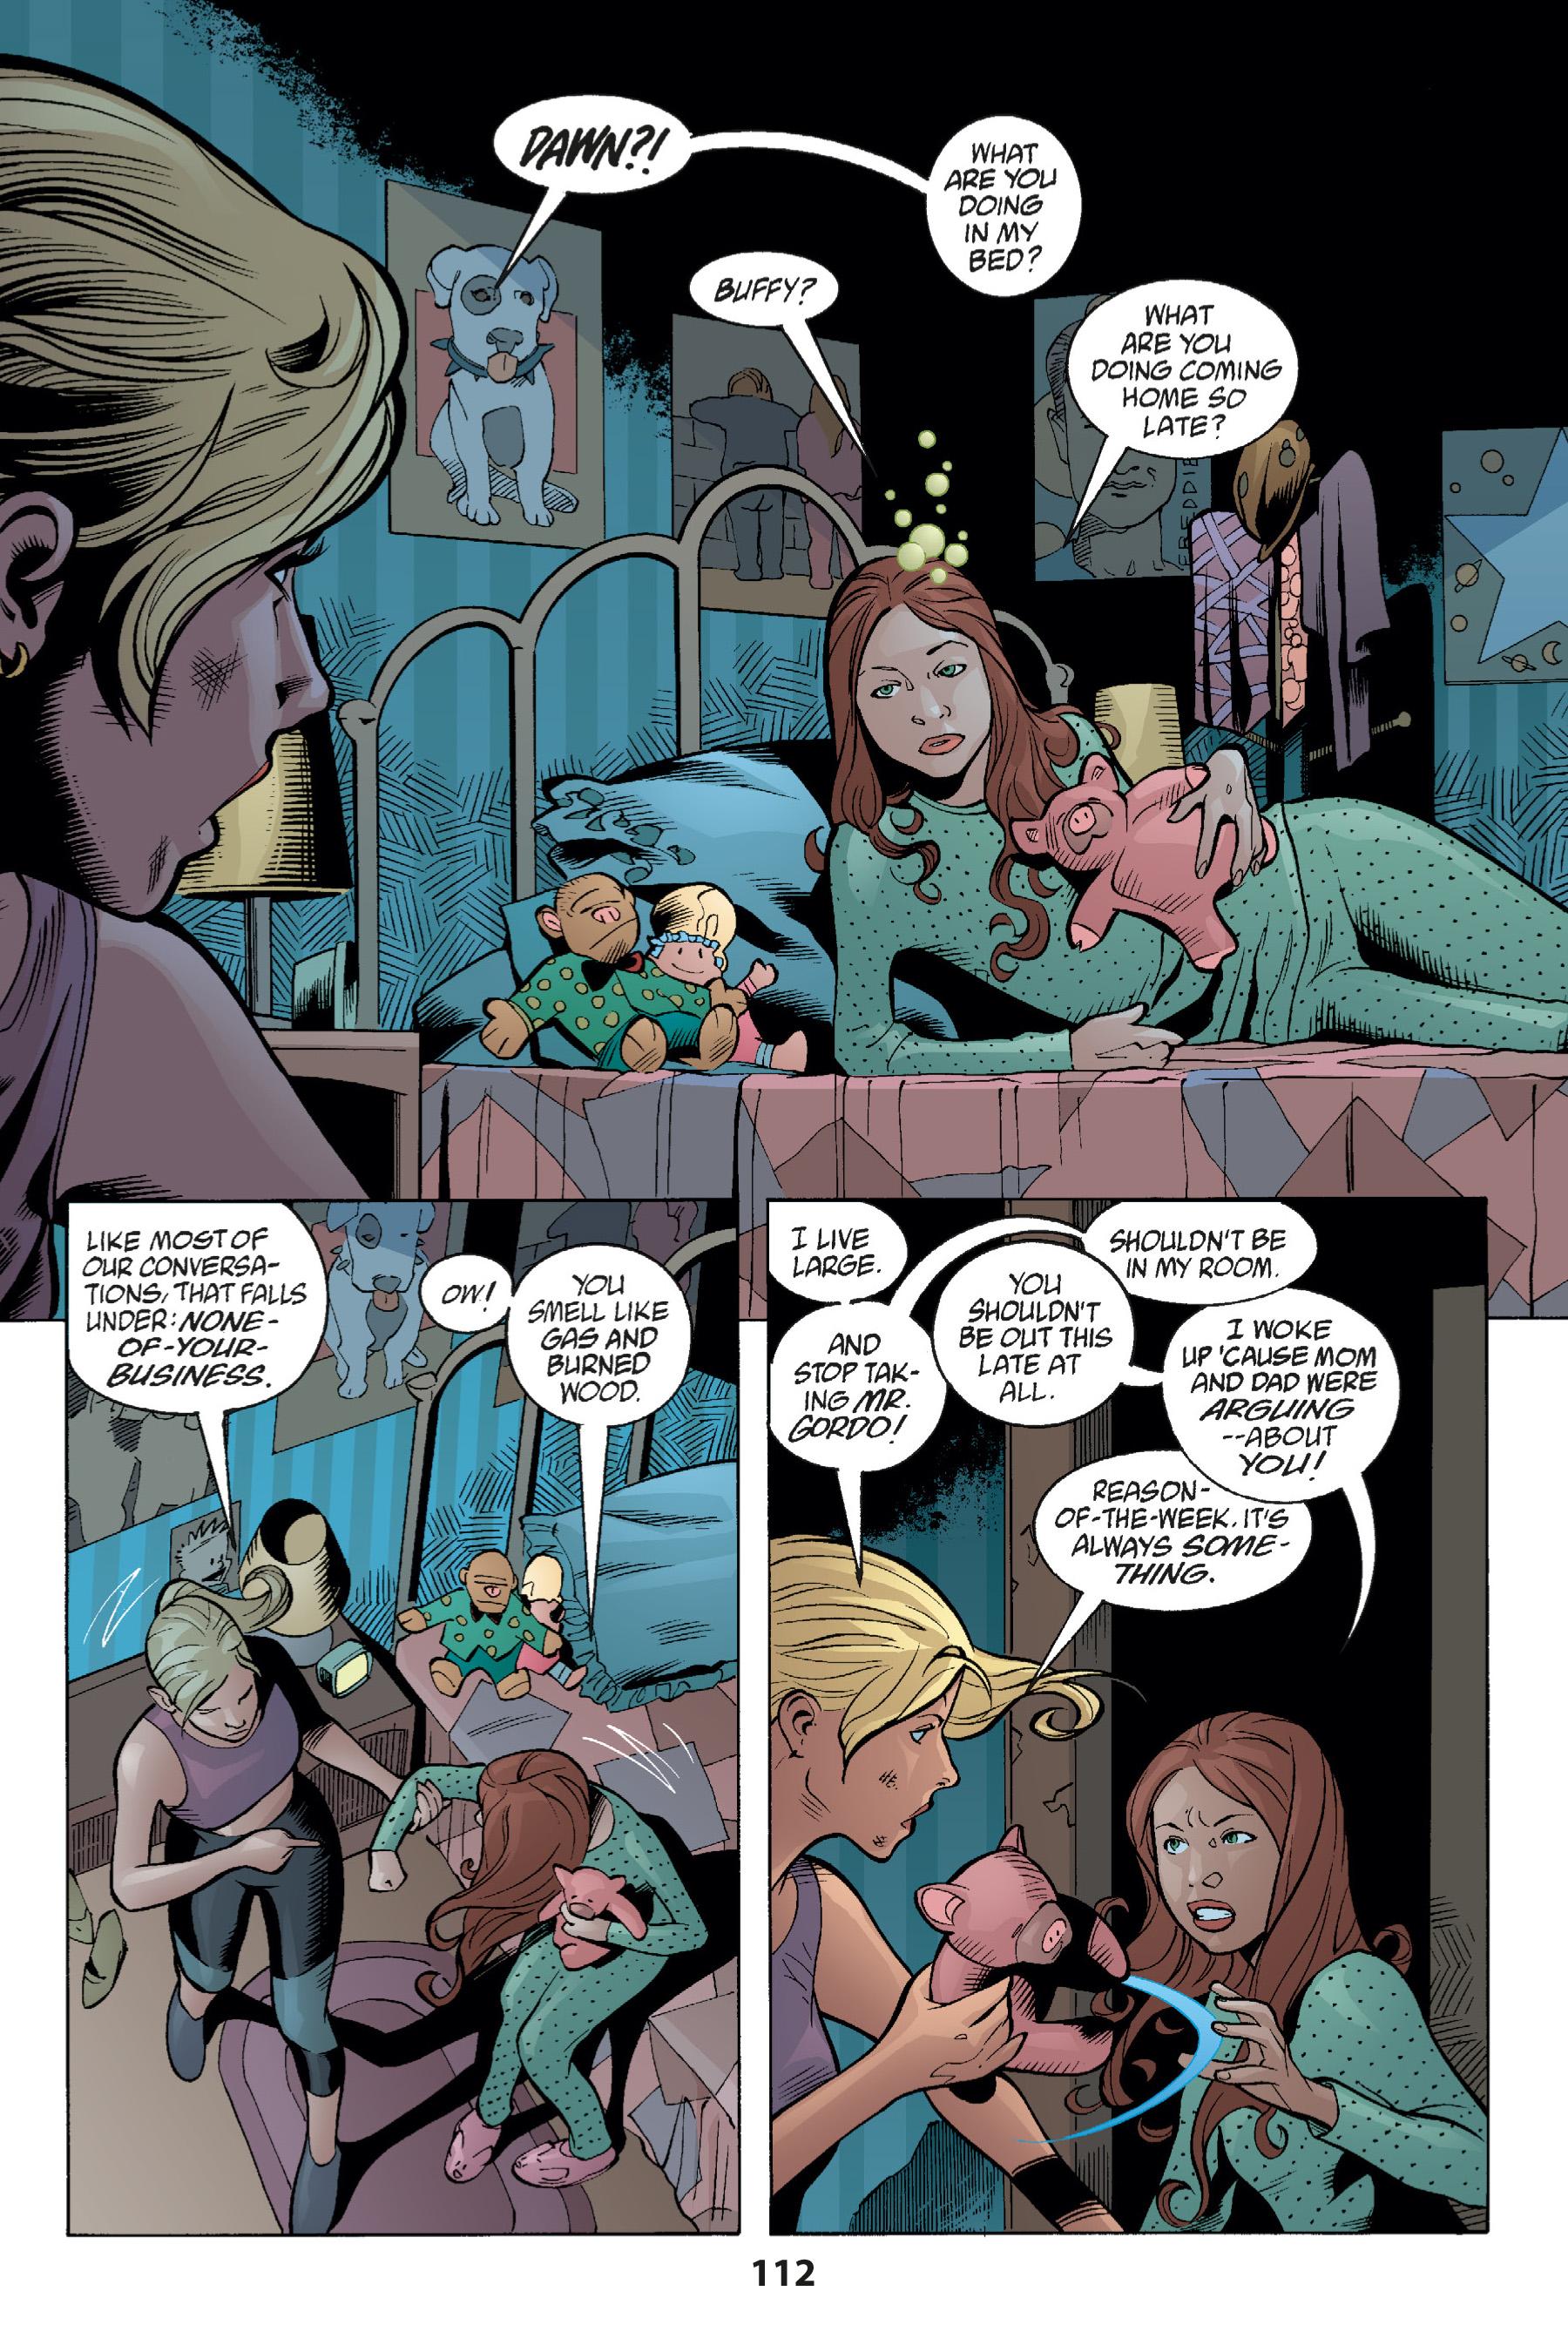 Read online Buffy the Vampire Slayer: Omnibus comic -  Issue # TPB 1 - 111